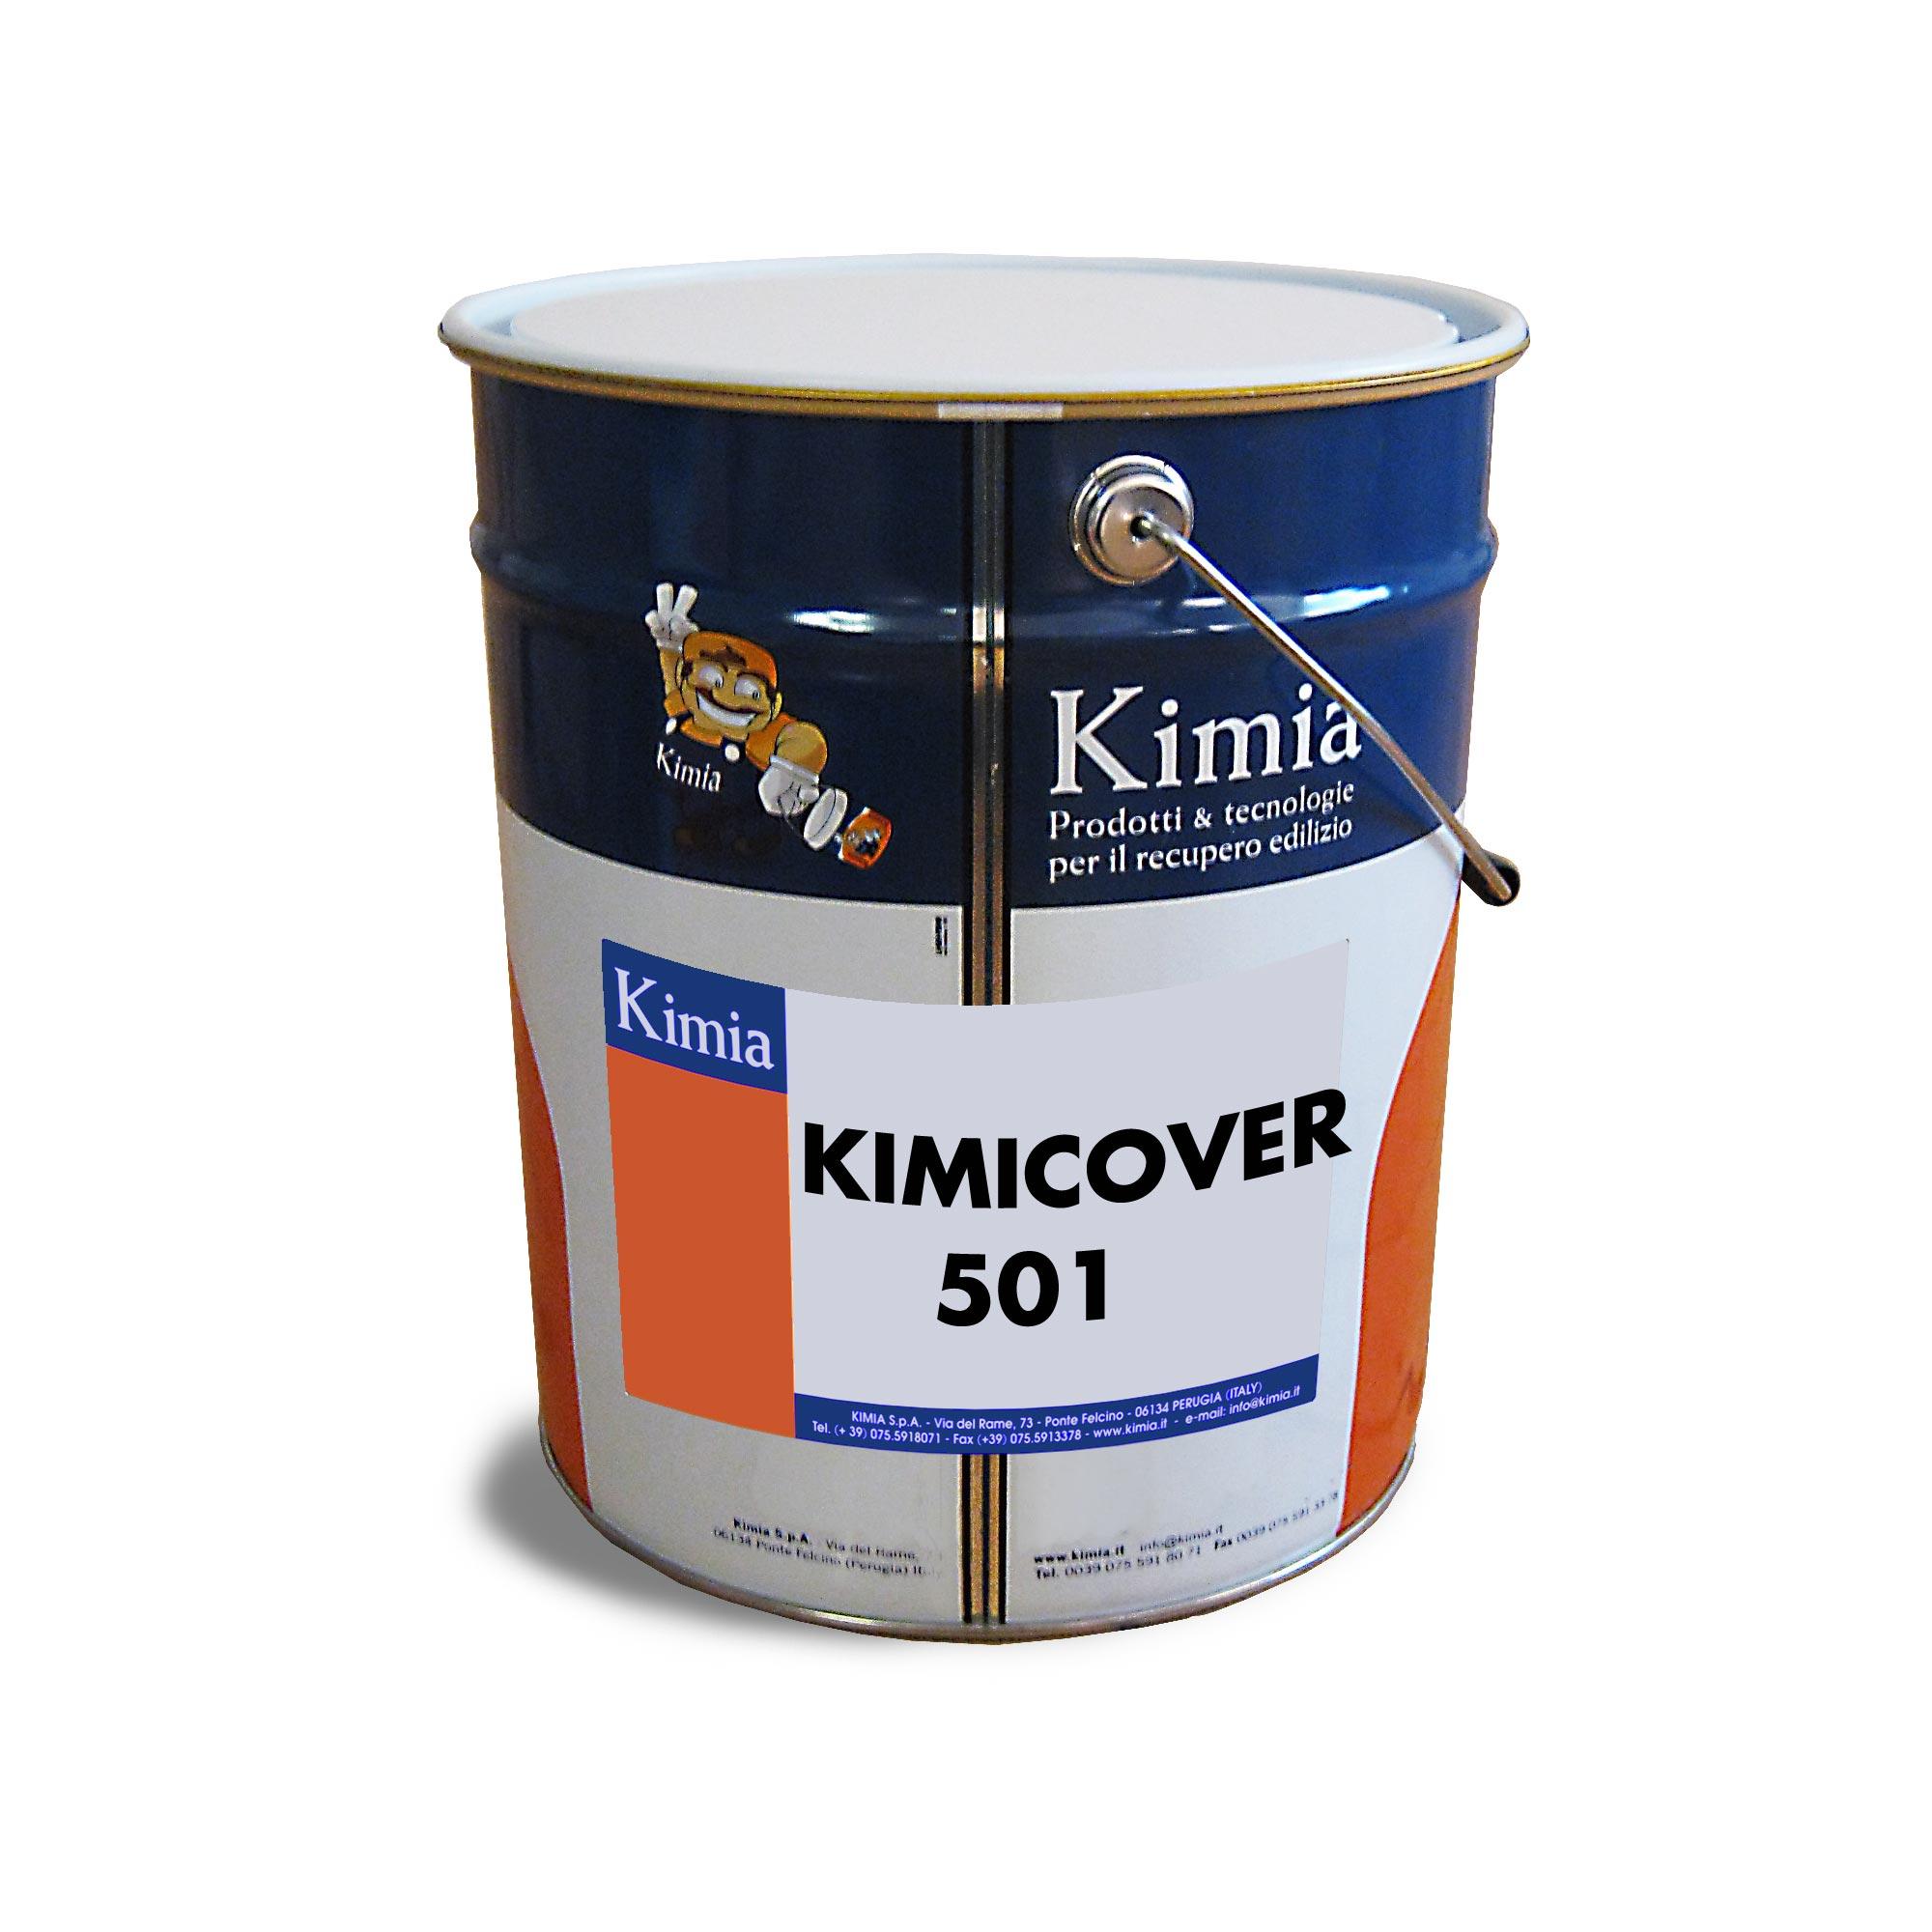 Kimicover 501